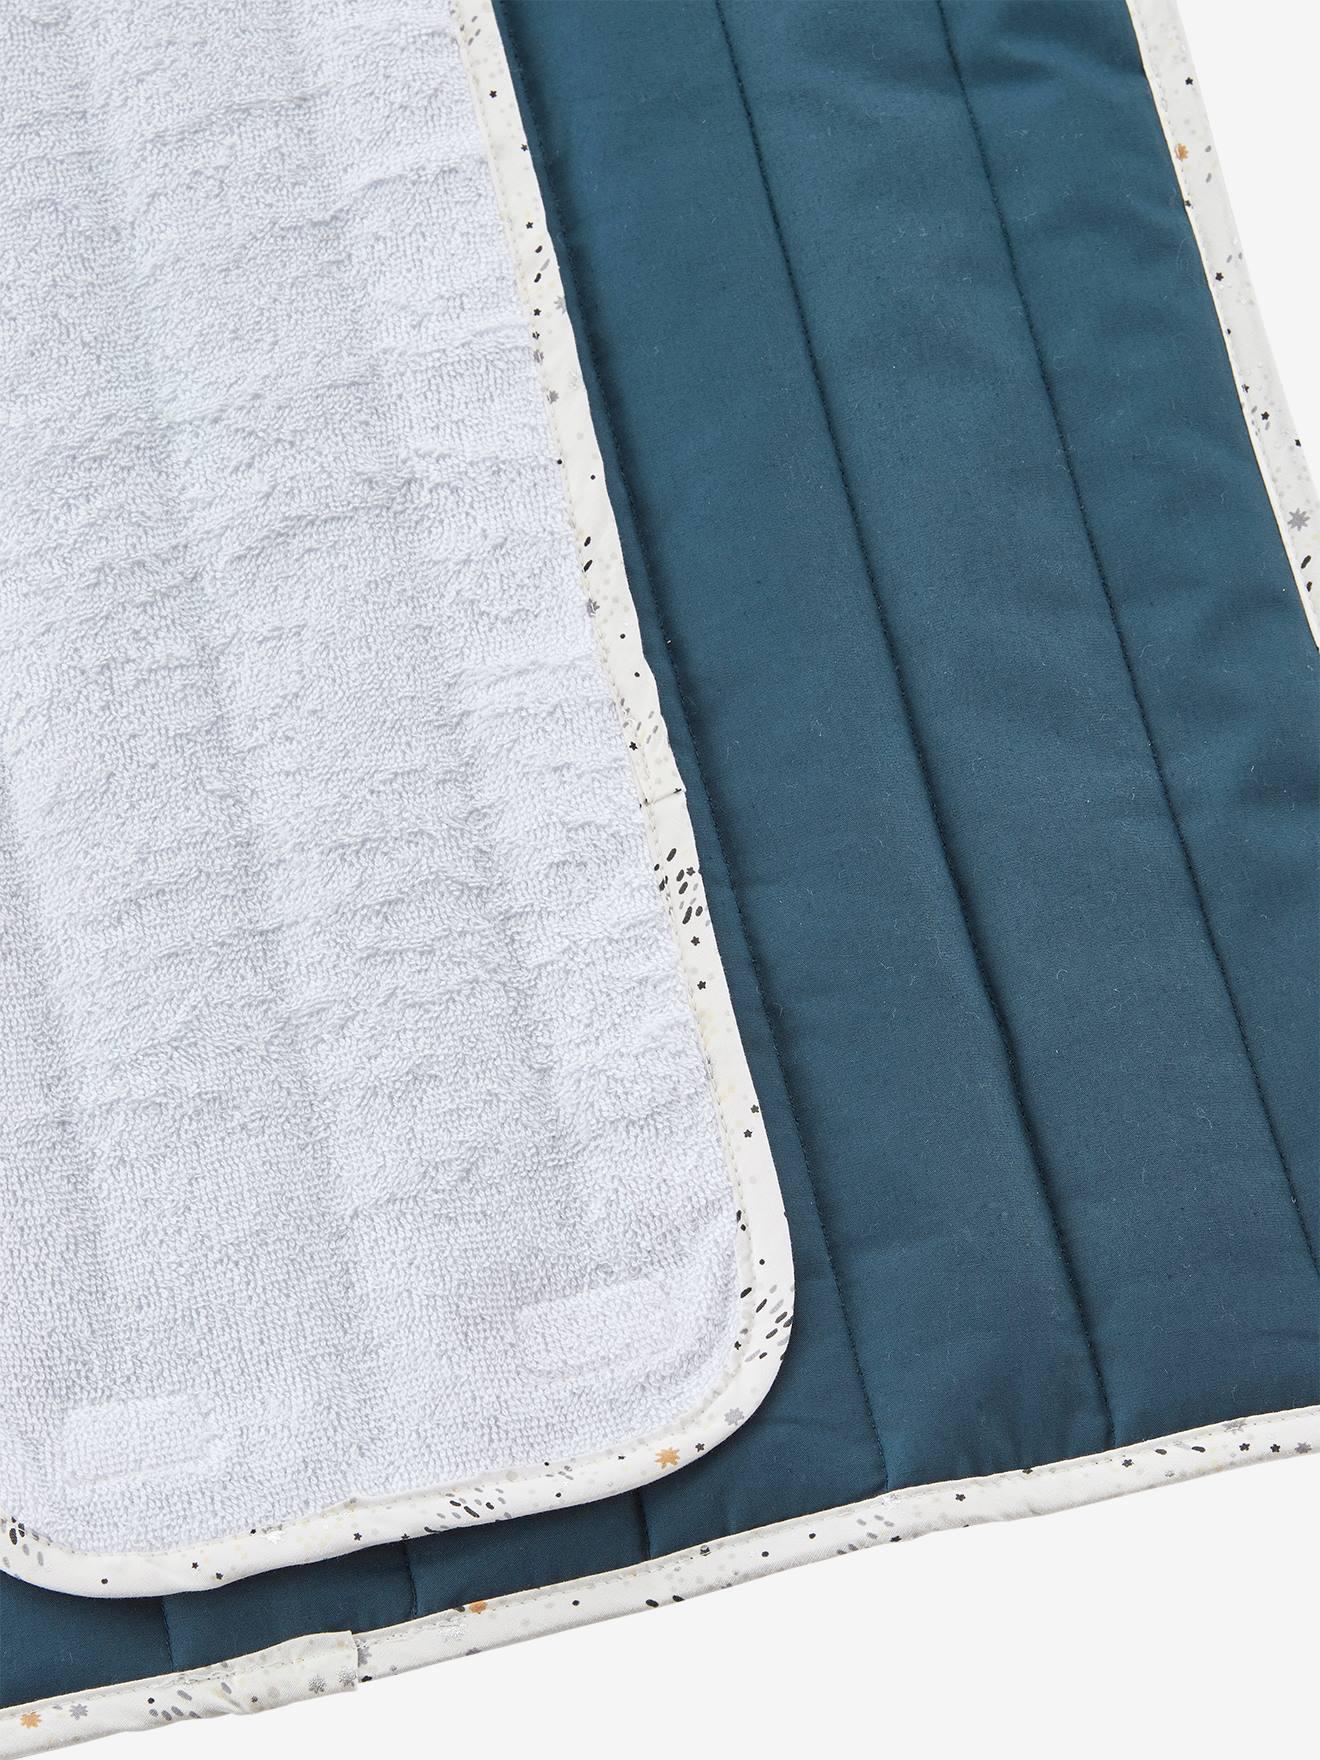 tapis a langer de voyage blanc imprime